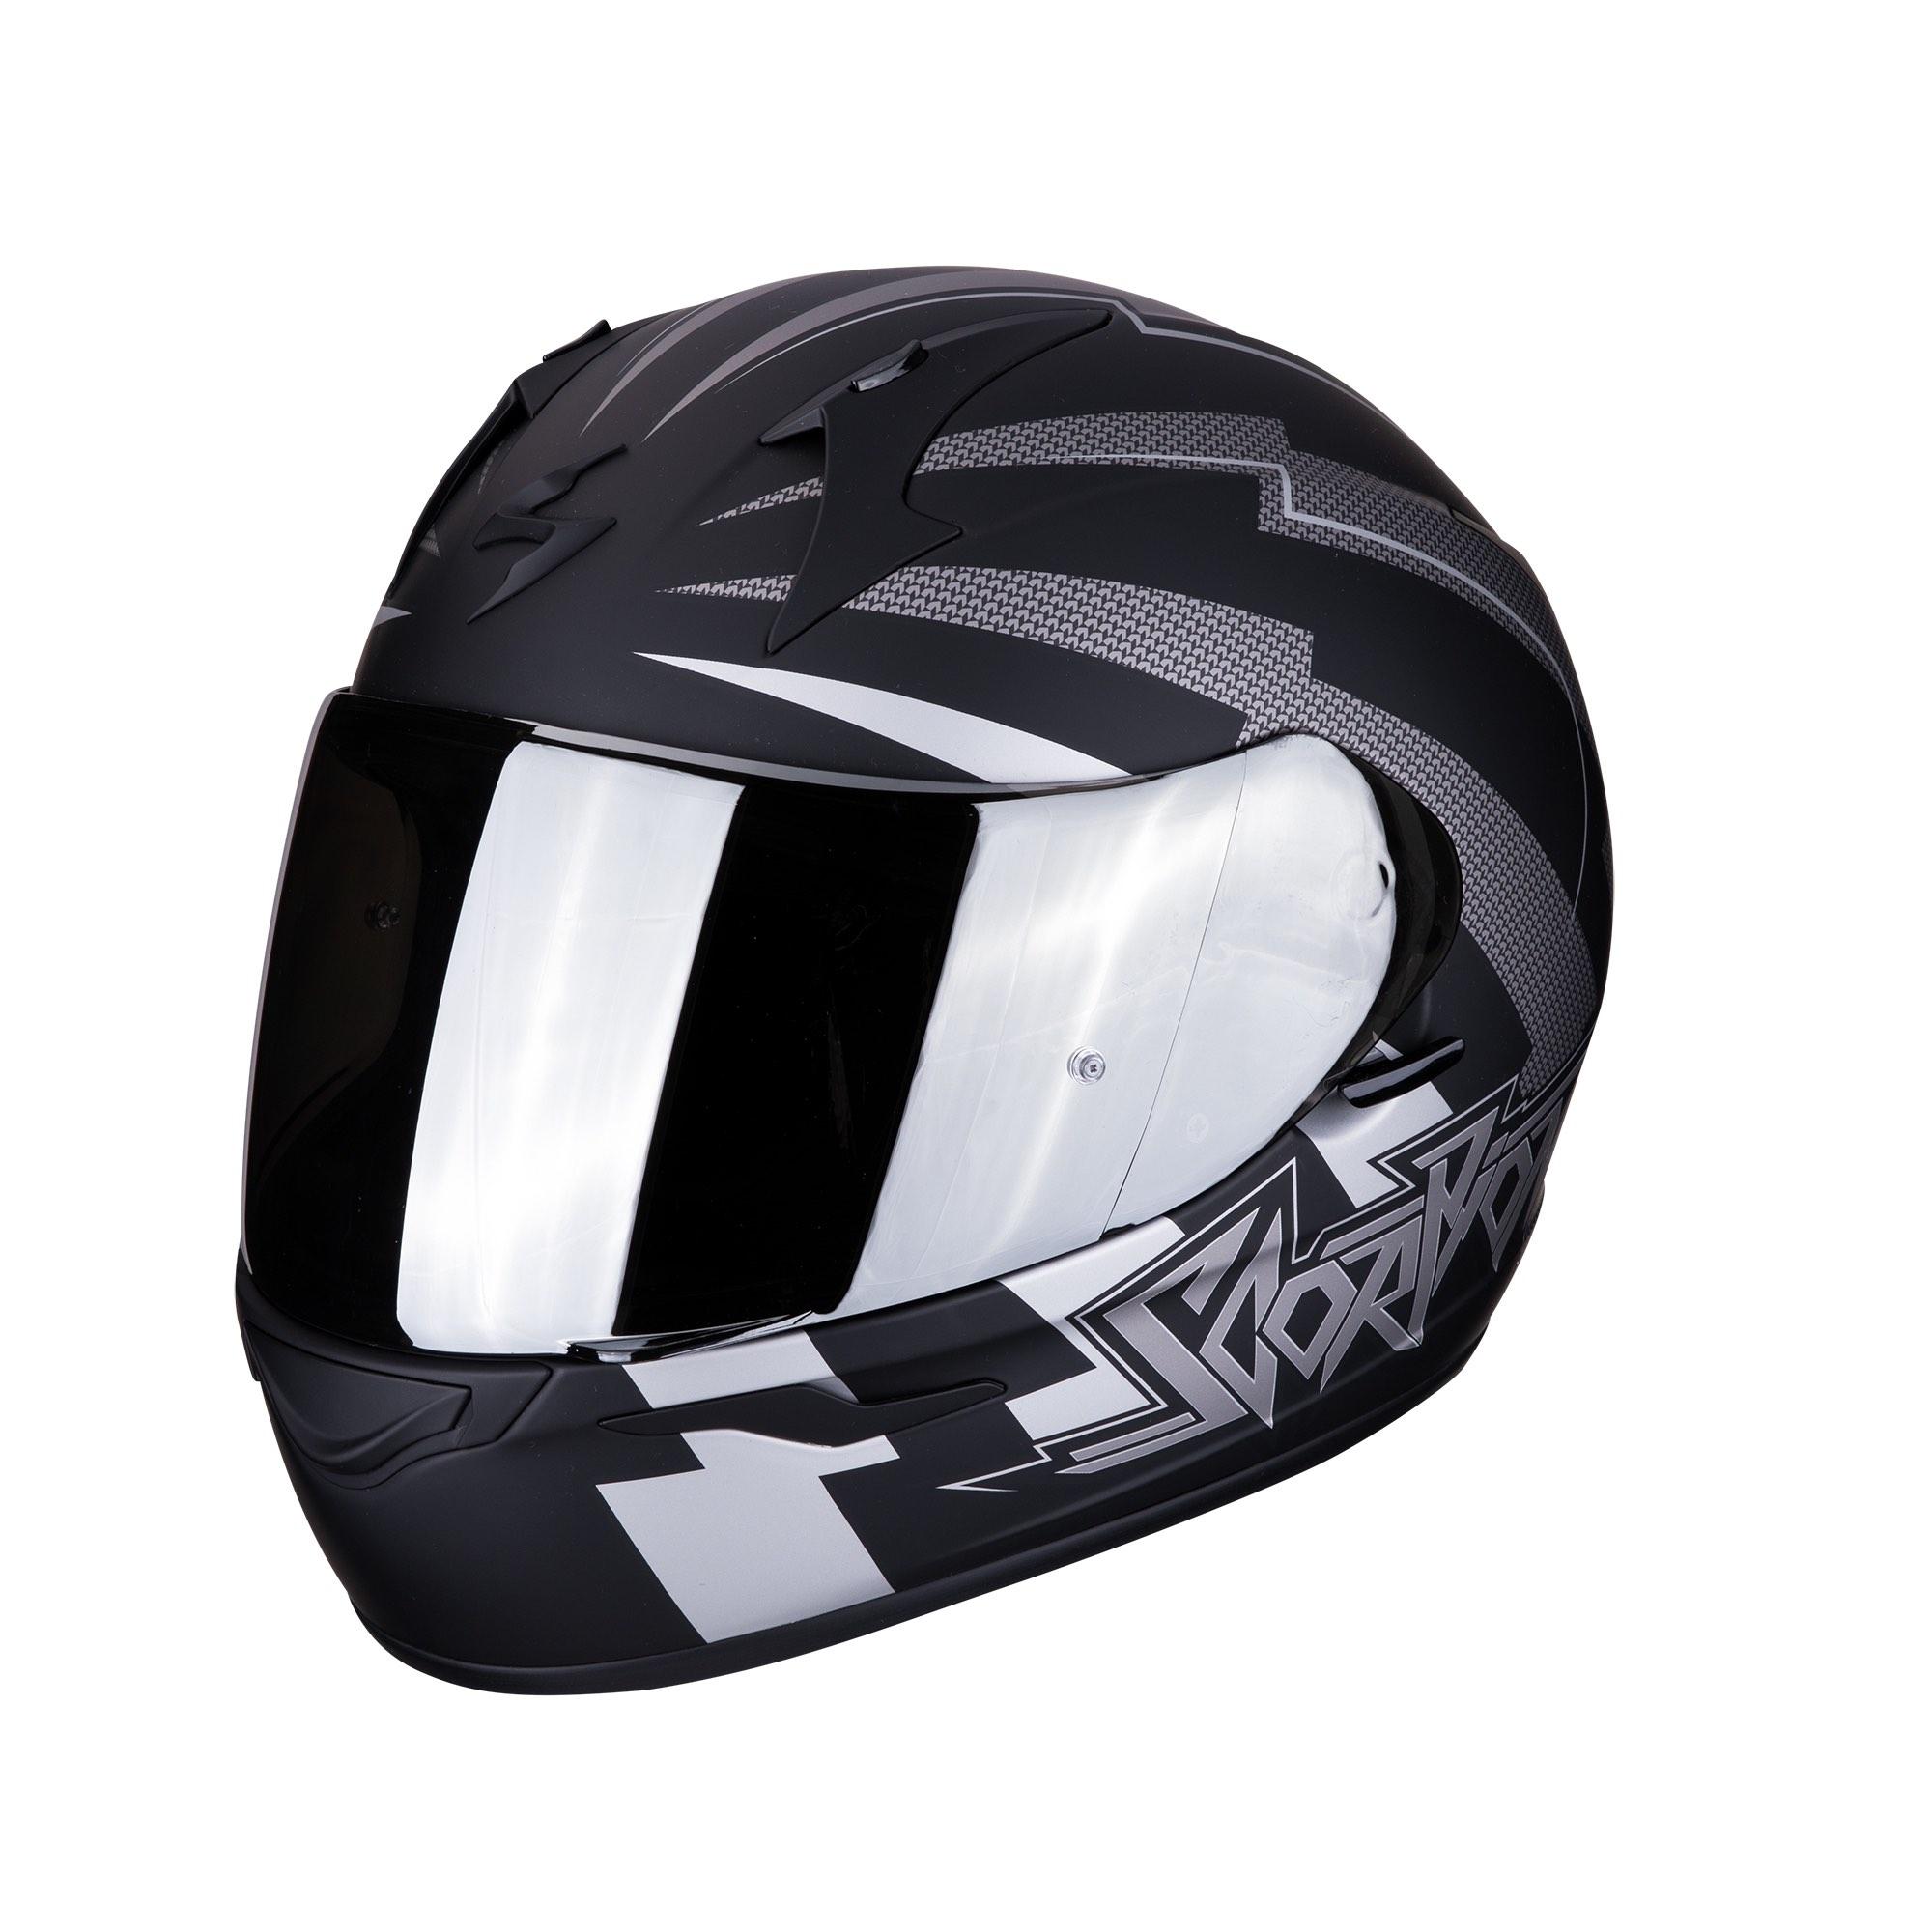 XS Negro//Gris Scorpion Casco de moto EXO-390 ONEWAY Matt Black-Silver